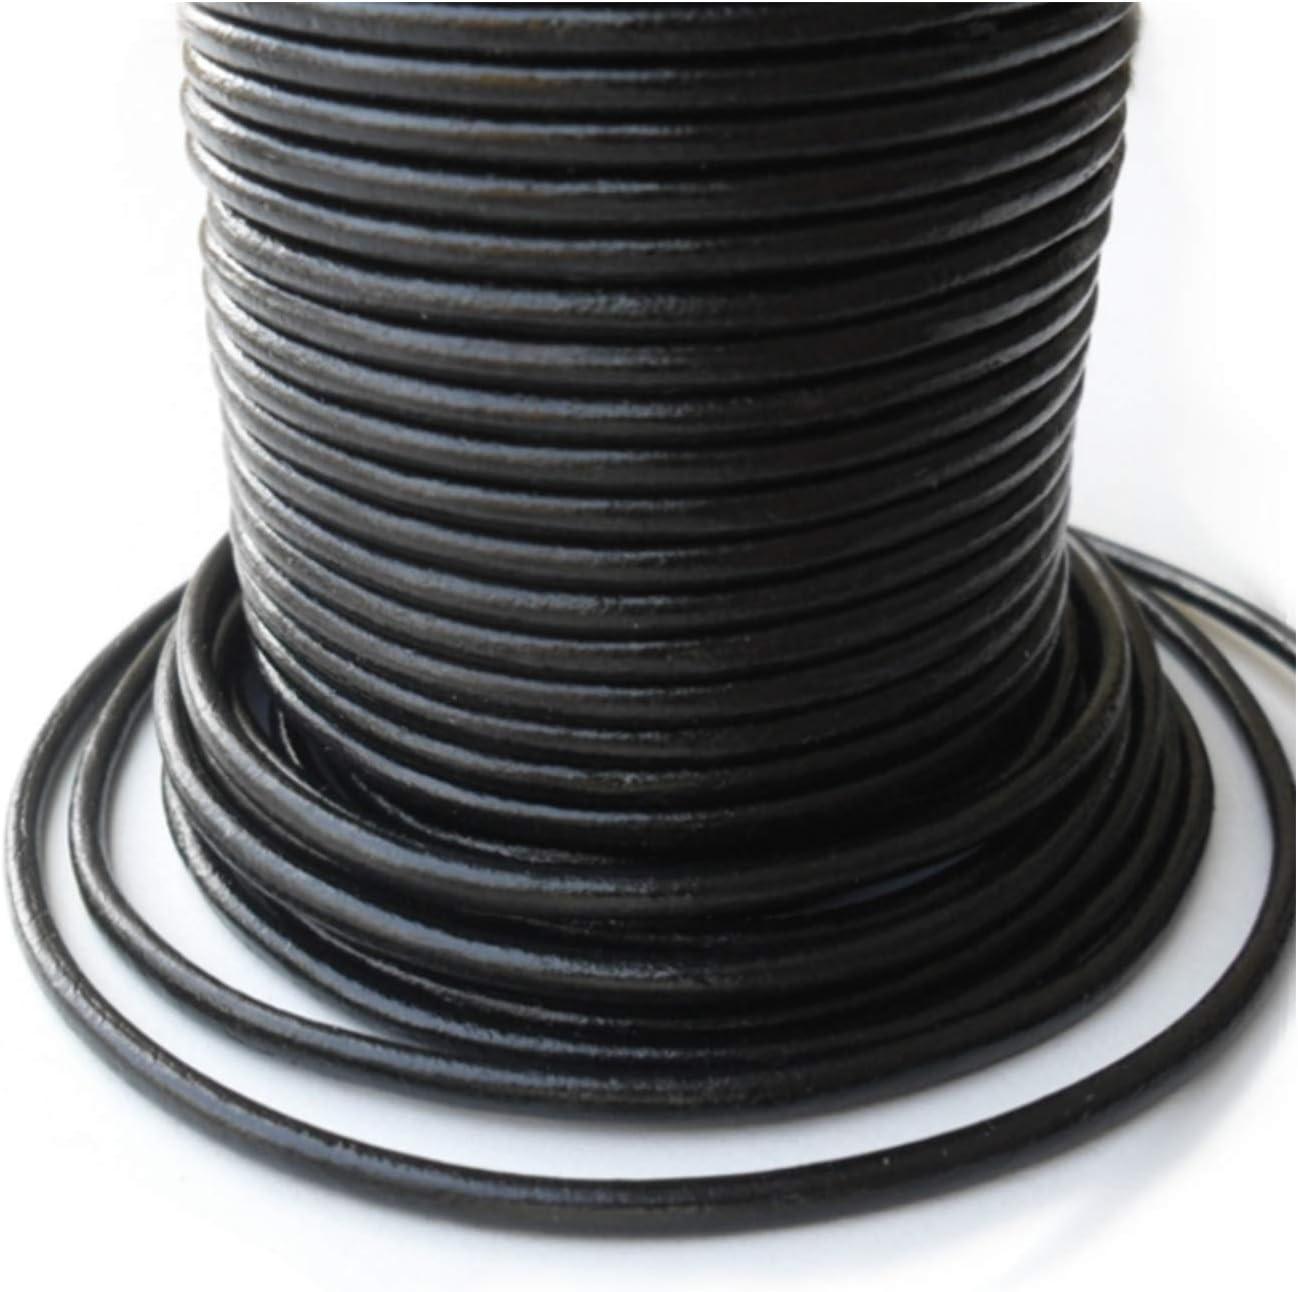 Auroris - 10m Bargain sale Leather Cord Round Challenge the lowest price of Japan ☆ 4 mm Ø Black